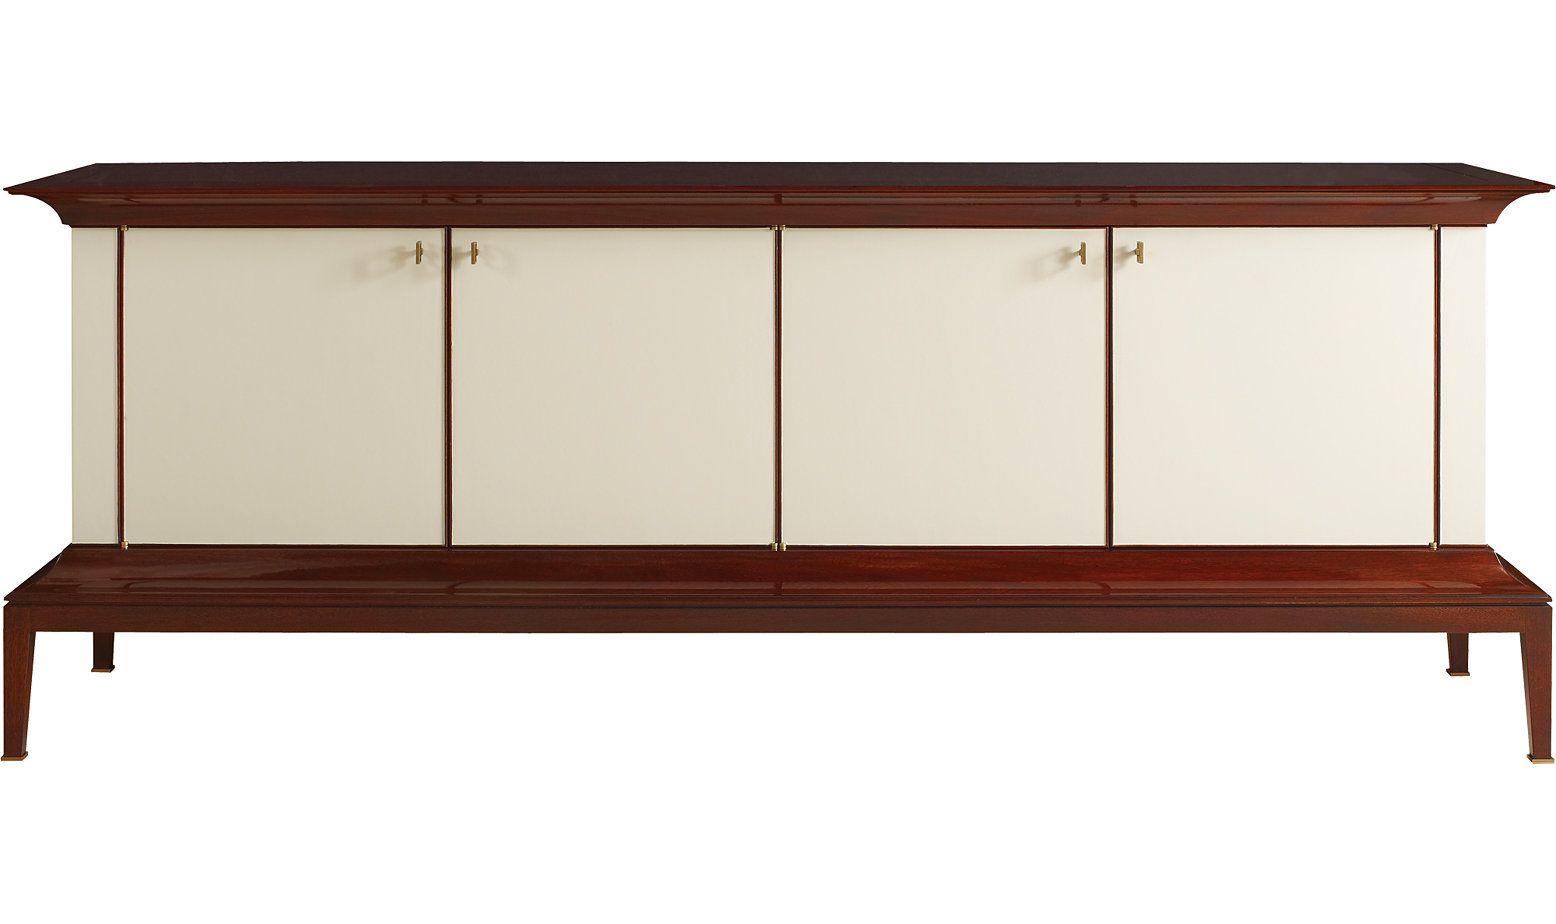 Moderne Credenza By Thomas Pheasant 8630 1 Baker Furniture